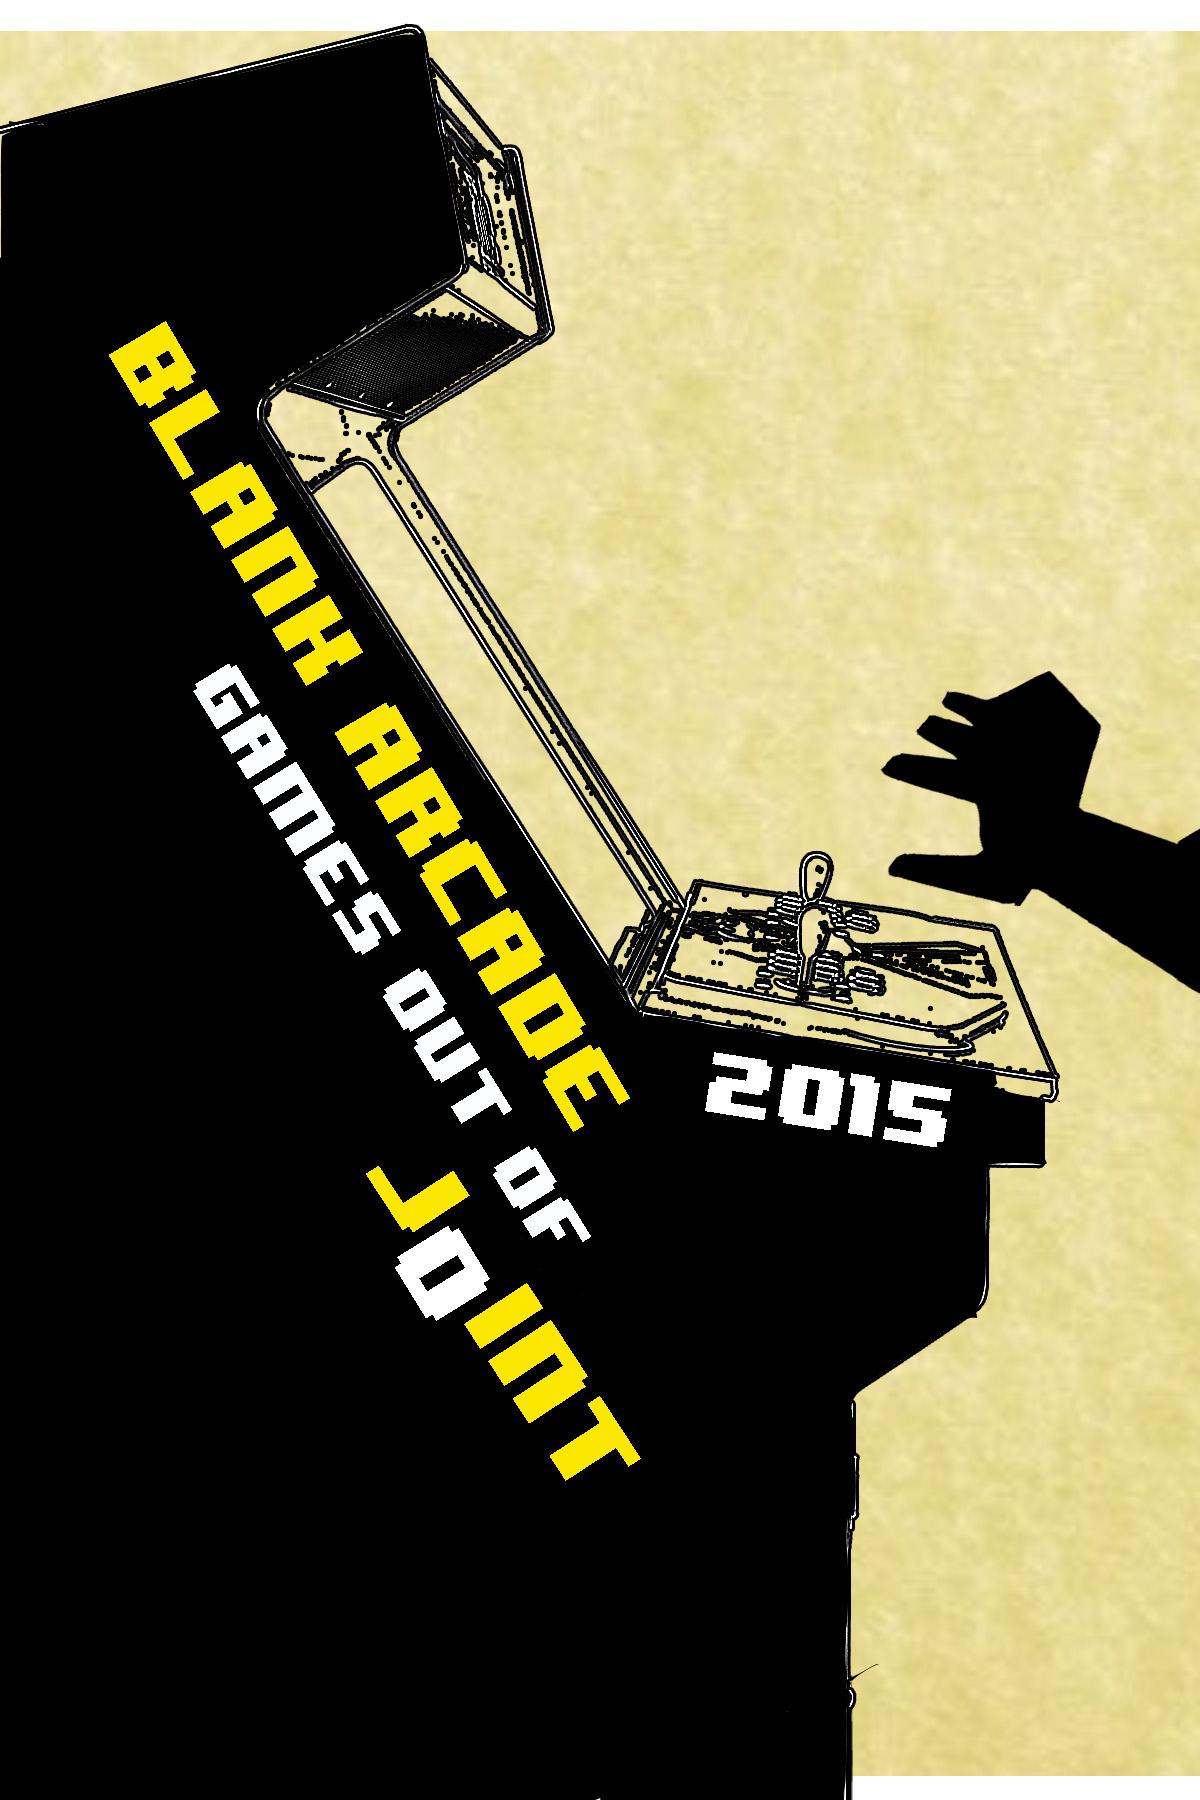 Book Cover, Blank Arcade 2015